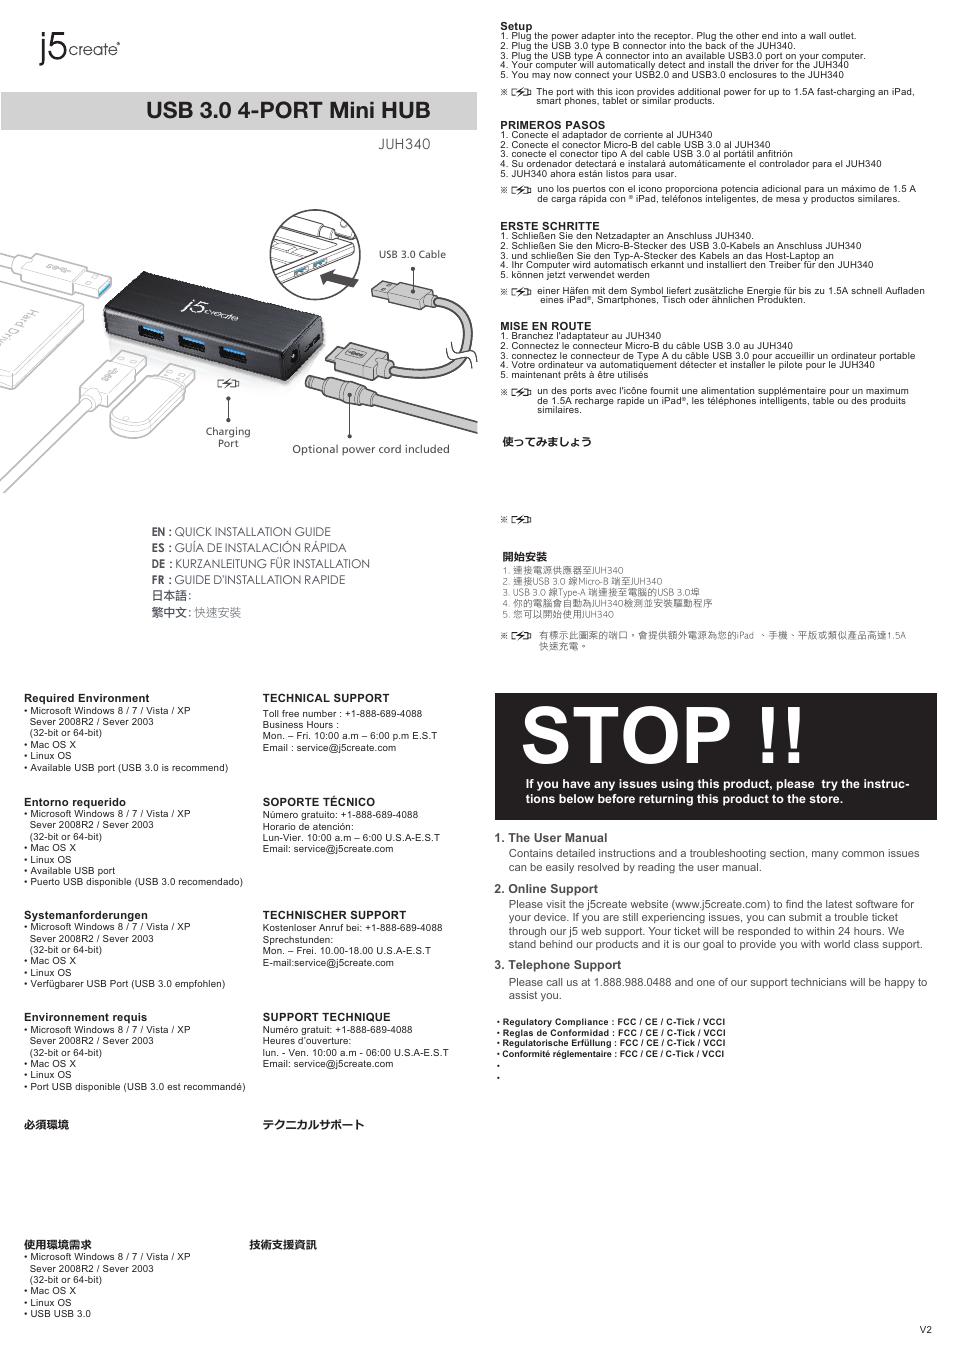 j5 create JUH340 USB 3 0 4-port Mini Hub User Manual | 1